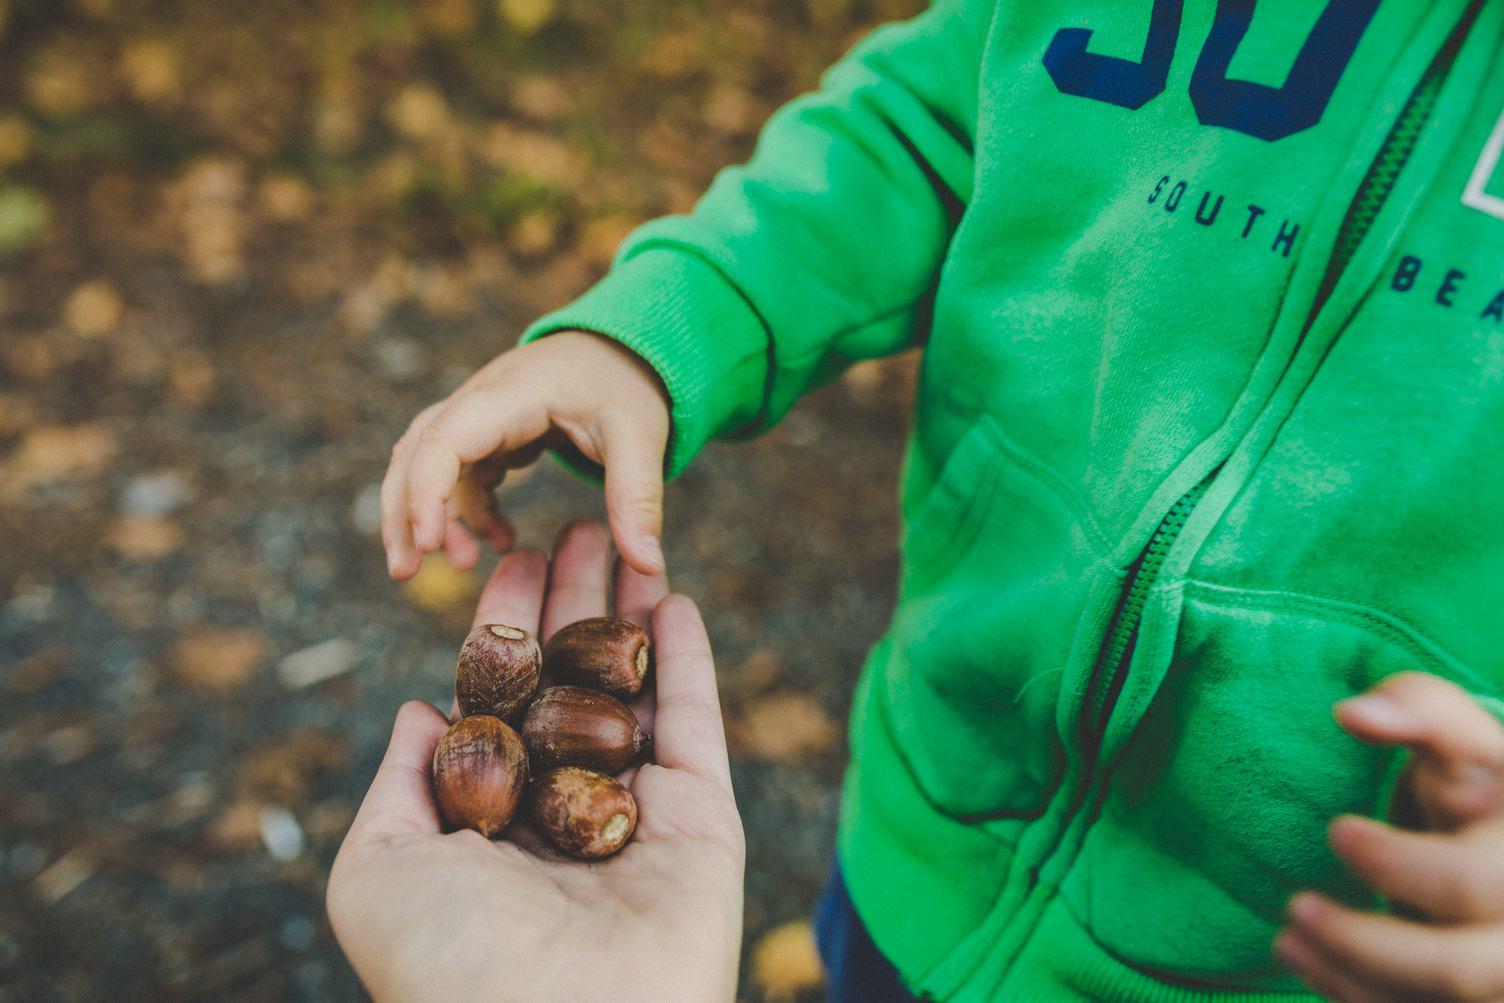 Little Boy in Autumn Park Taking a Handful of Acorns